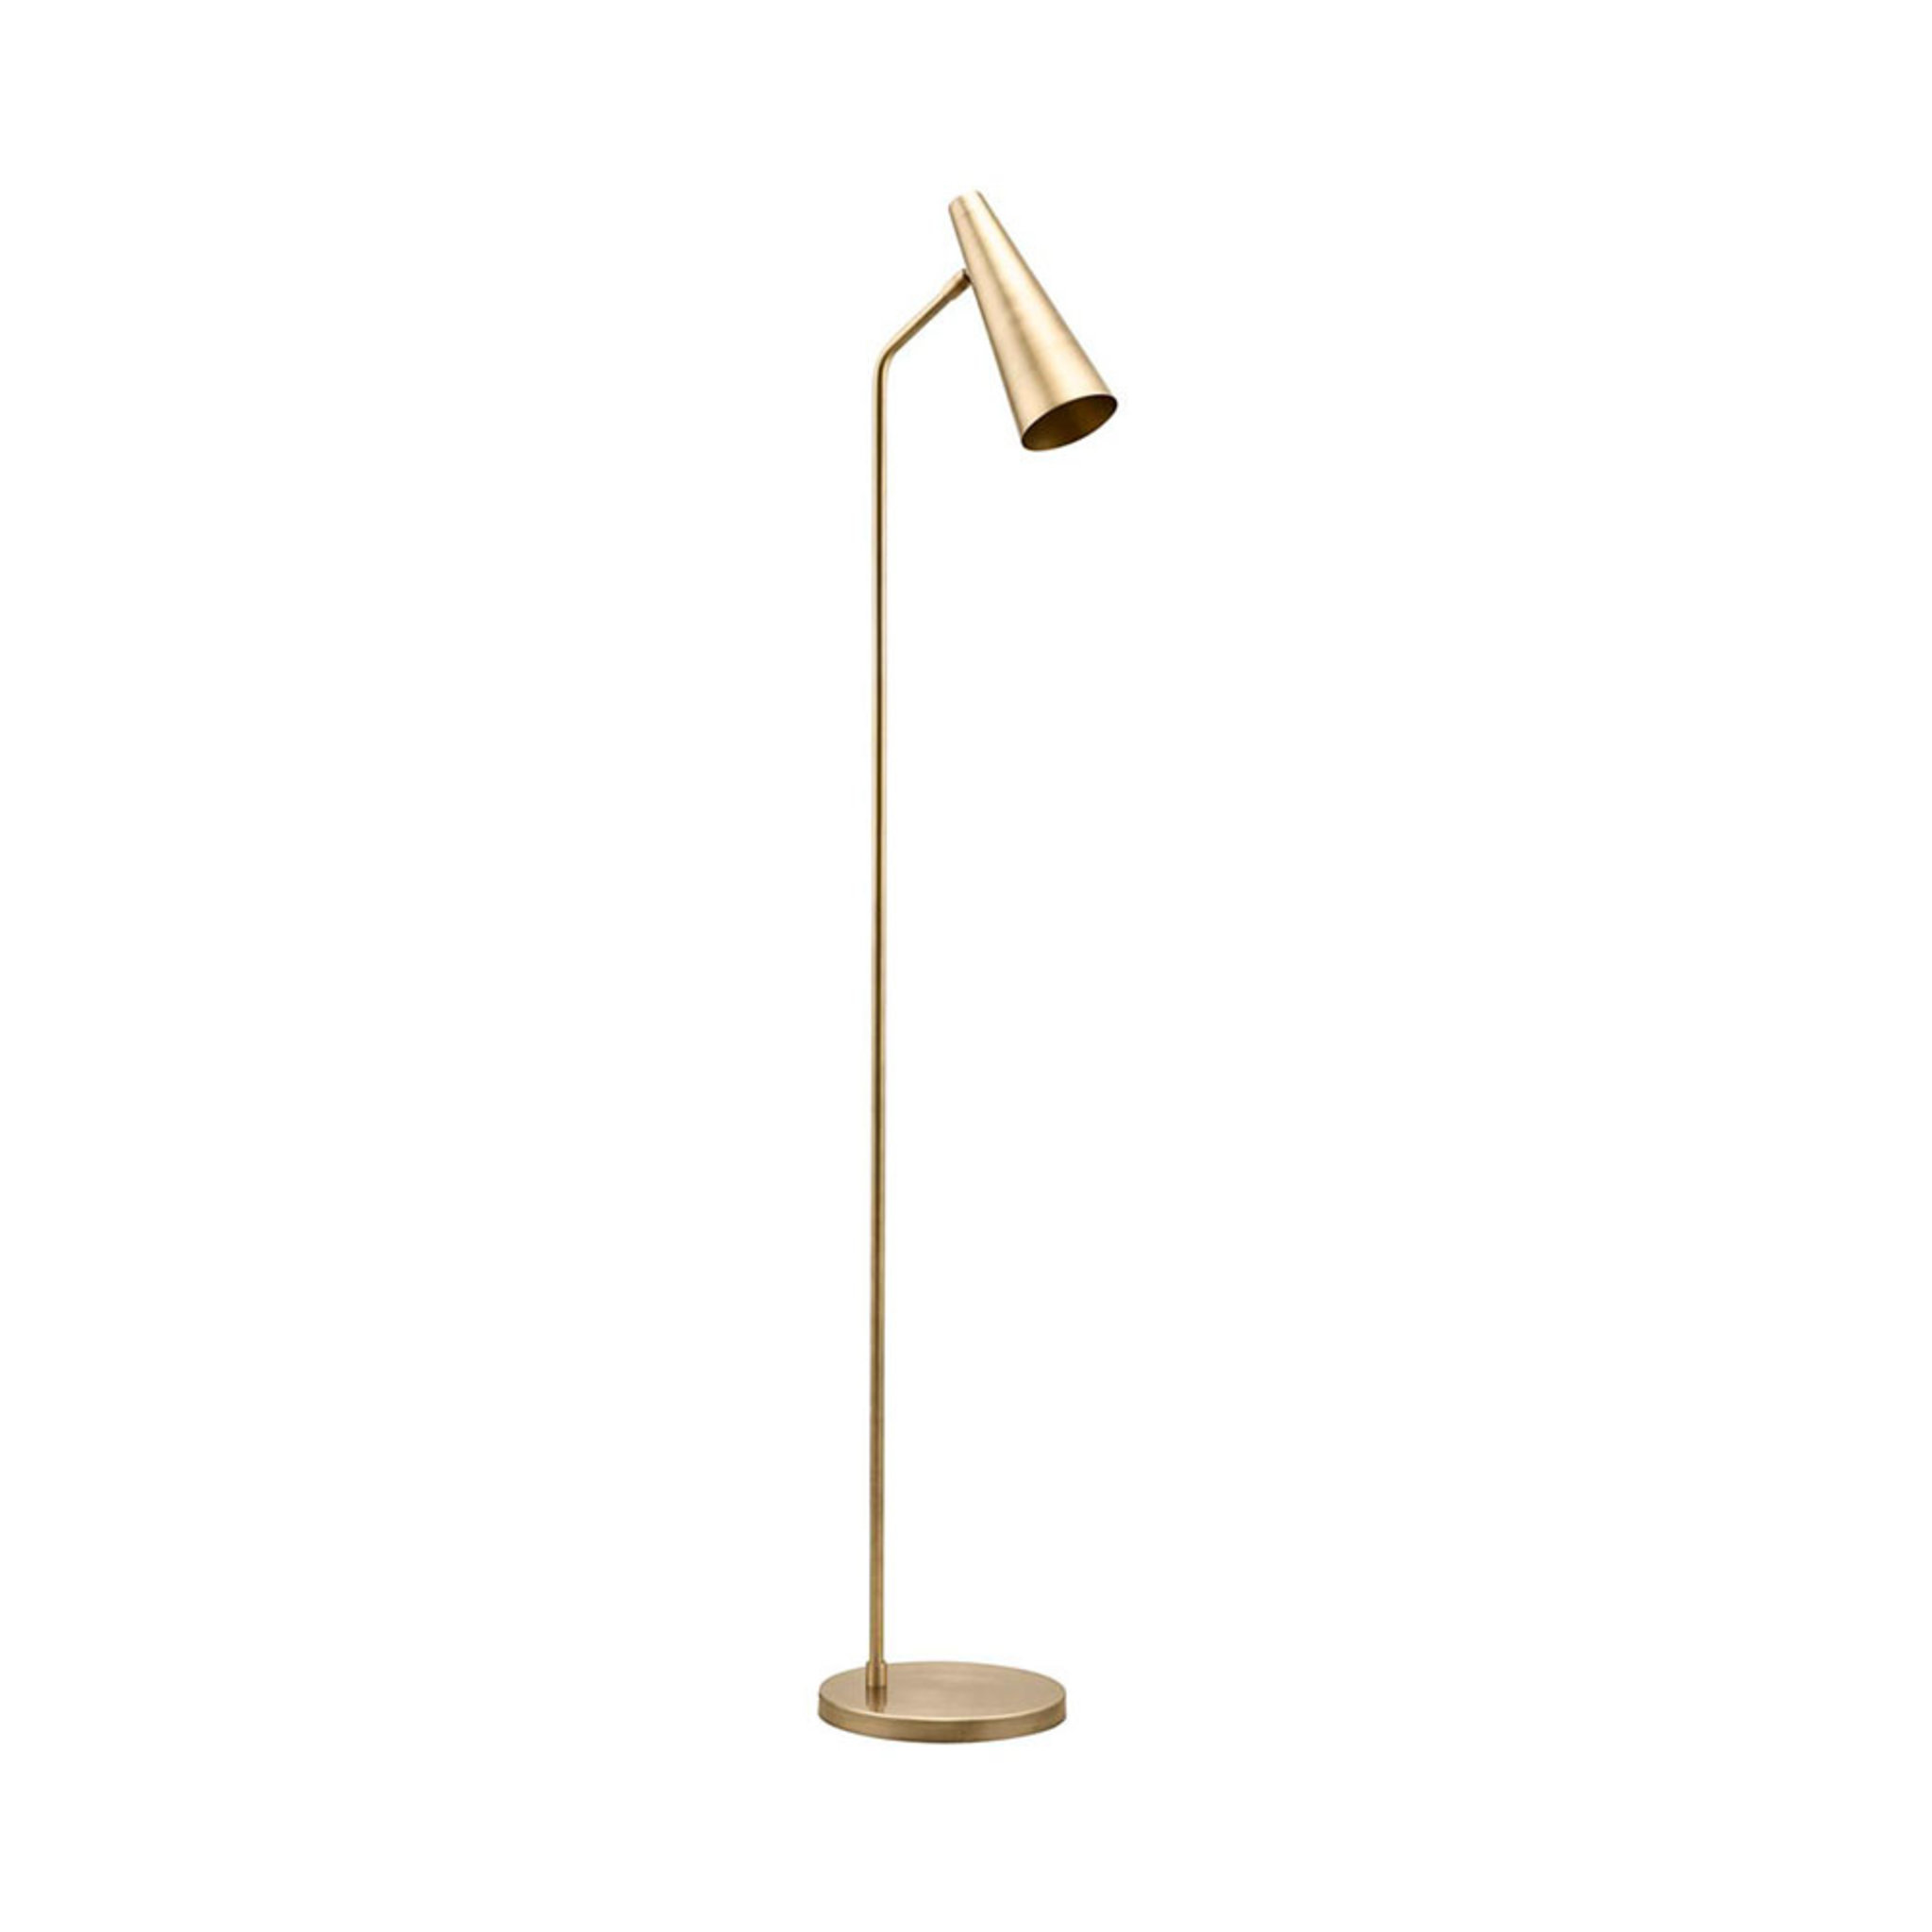 Golvlampa, Precise, 124 cm, mässing